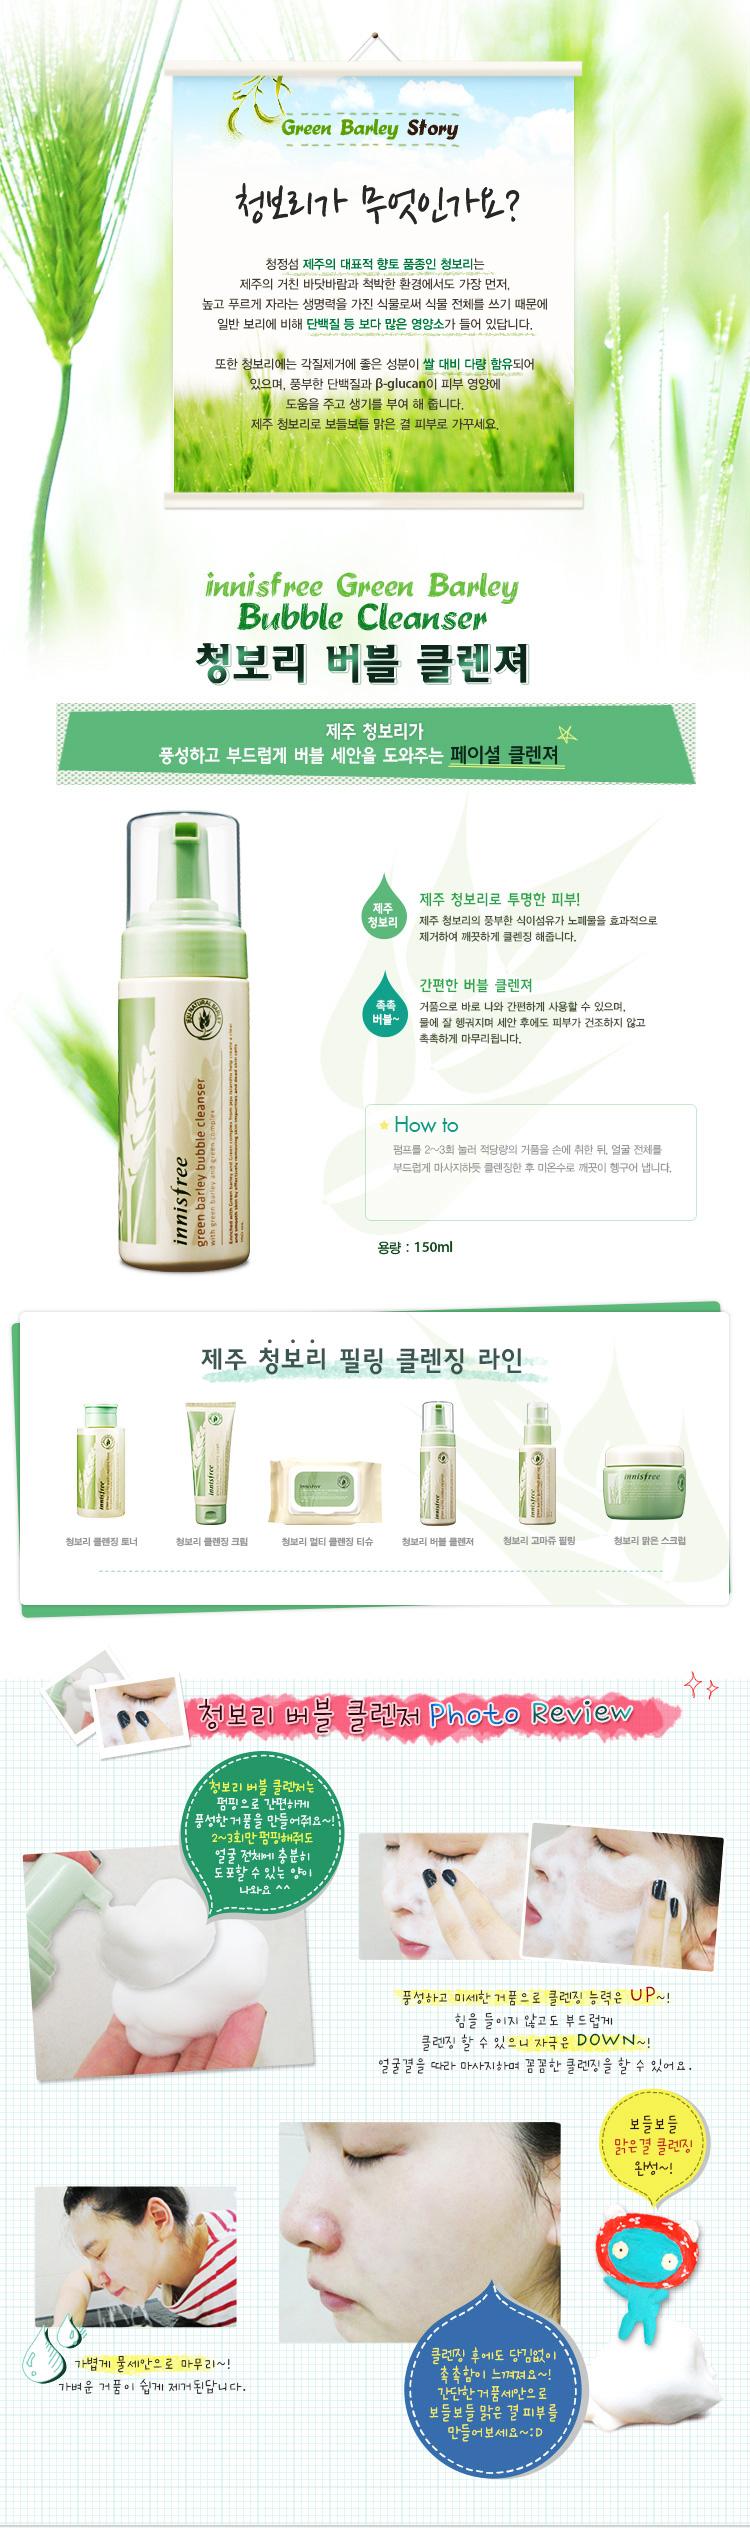 Innisfree - Green barley bubble cleanser